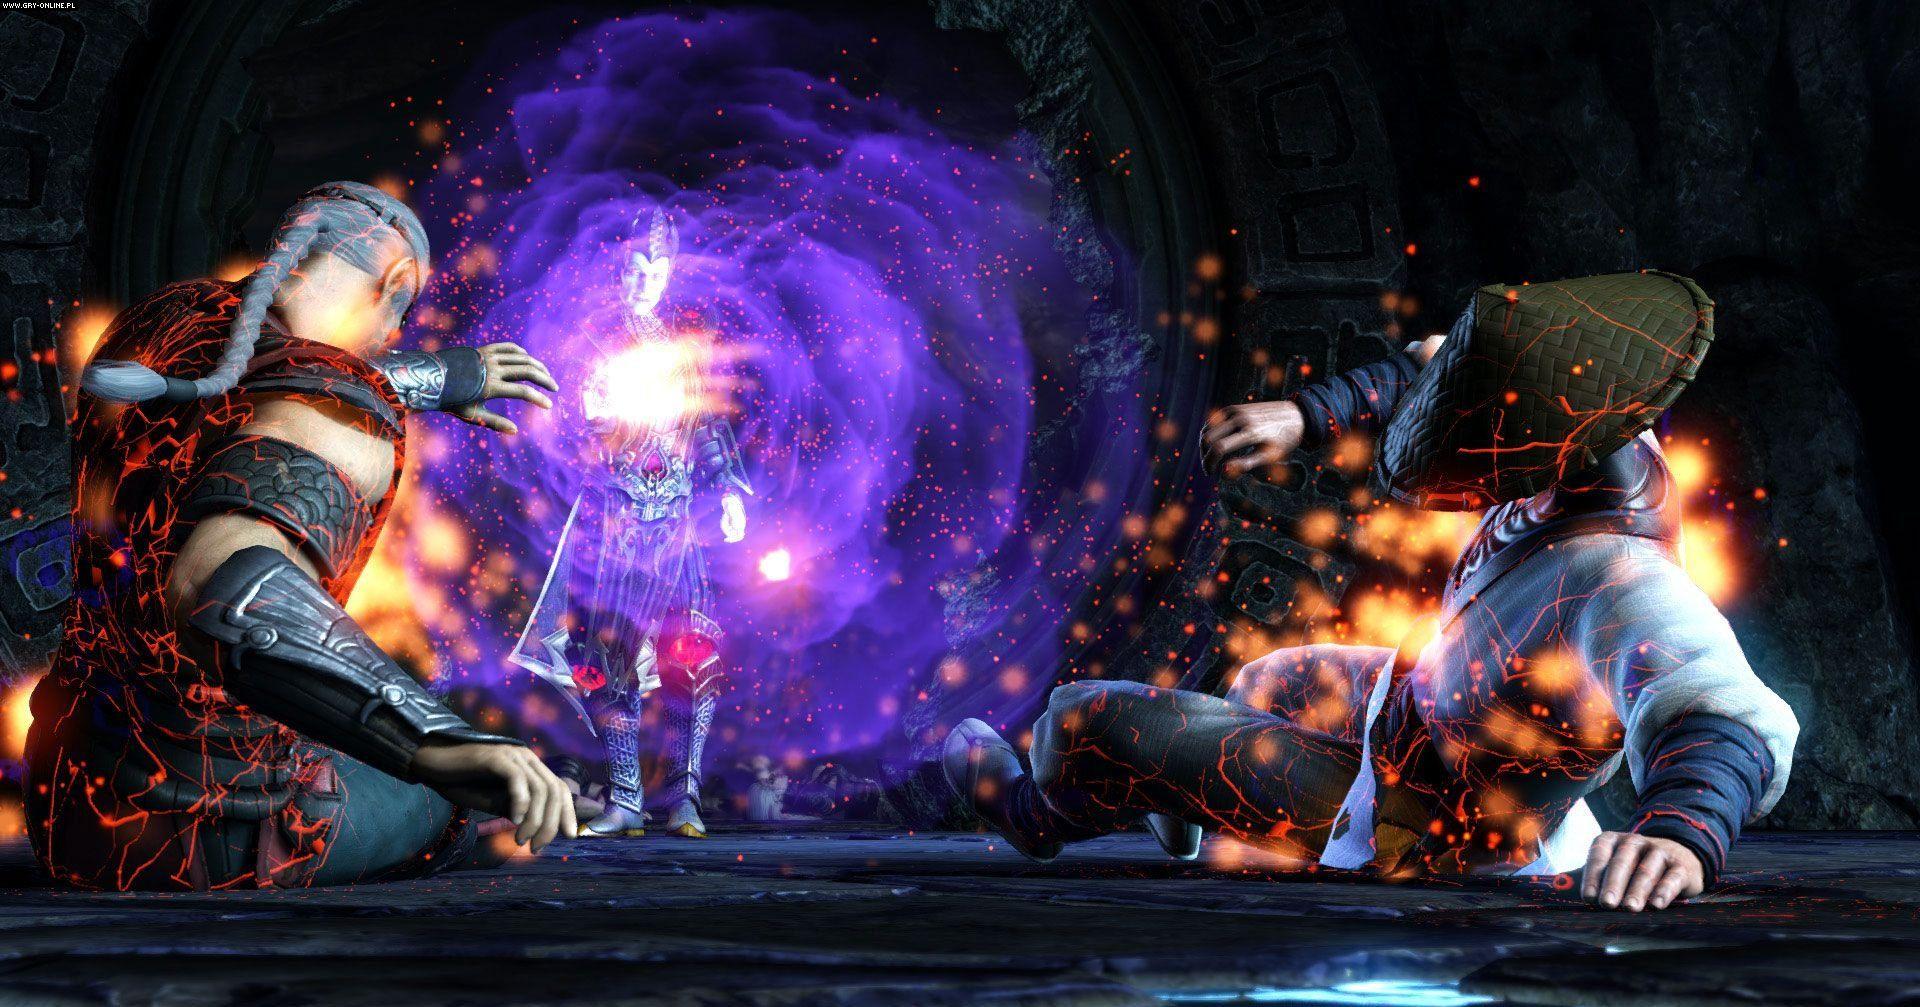 Mortal Kombat X image #1